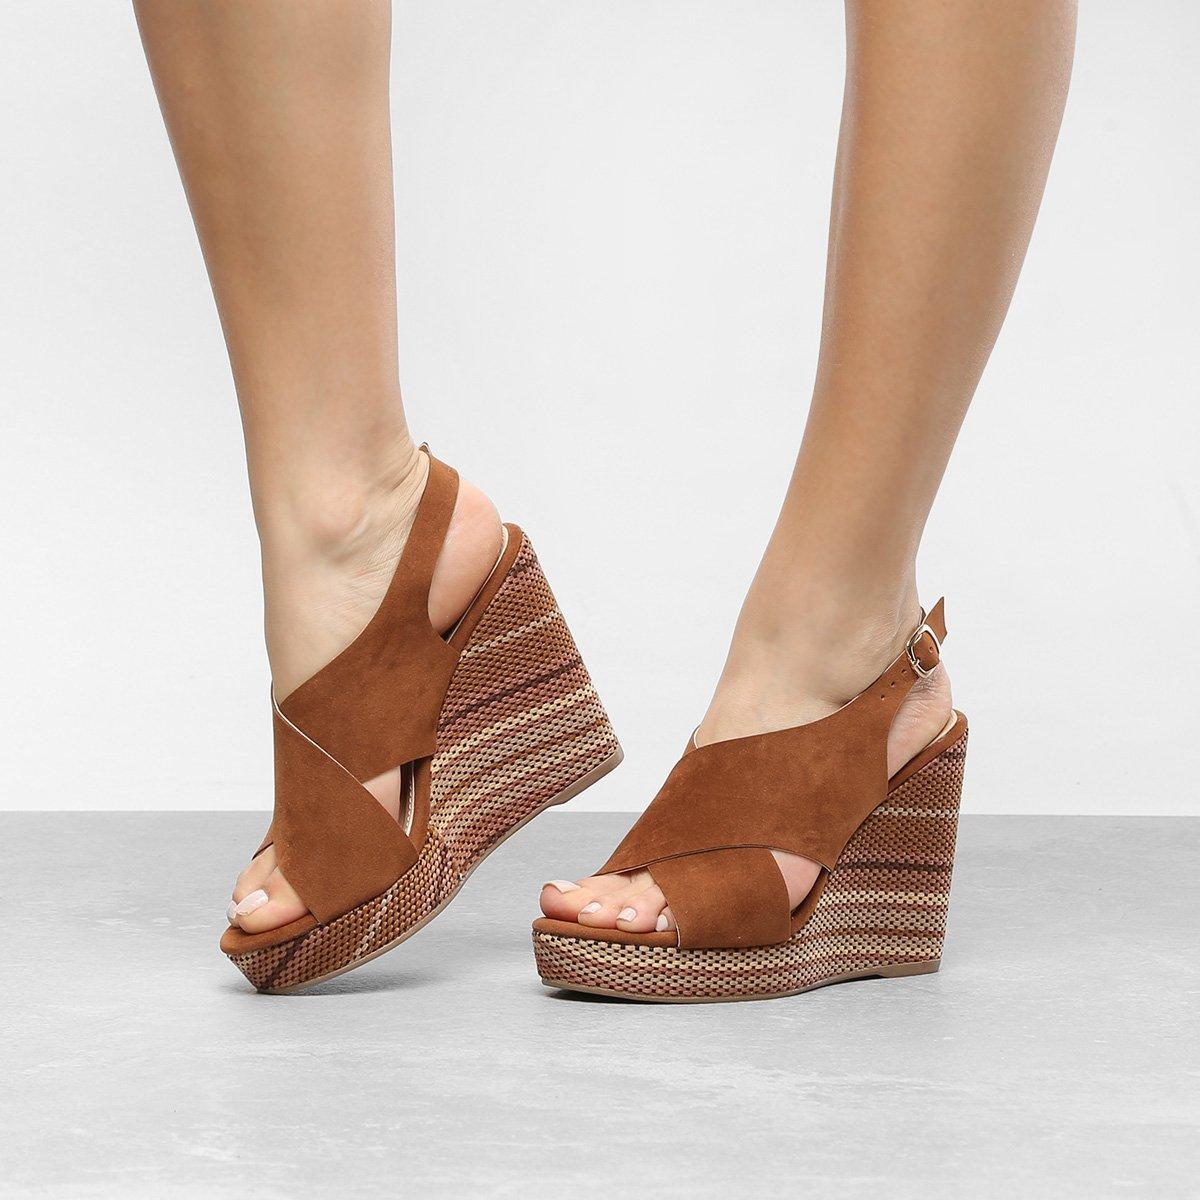 Me exibindo de sandalia anabela e jeans justo - 3 part 5